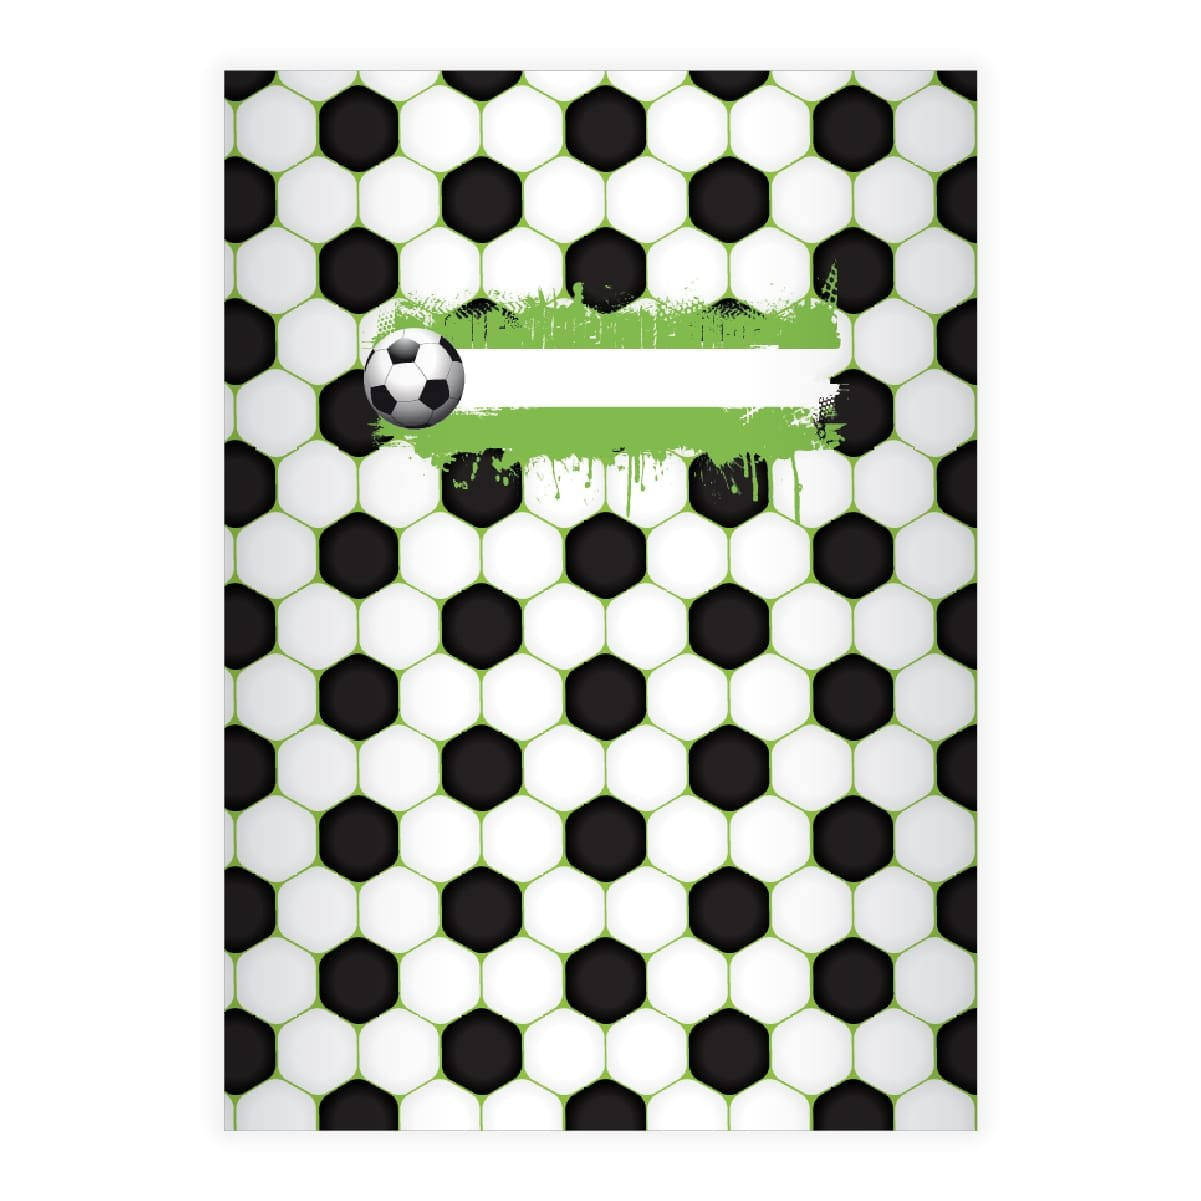 1 Coole Fußball Musters DIN A4 Schulheft, Rechenhefte für Fußball Fans Lineatur 28 (kariertes Heft) Kartenkaufrausch